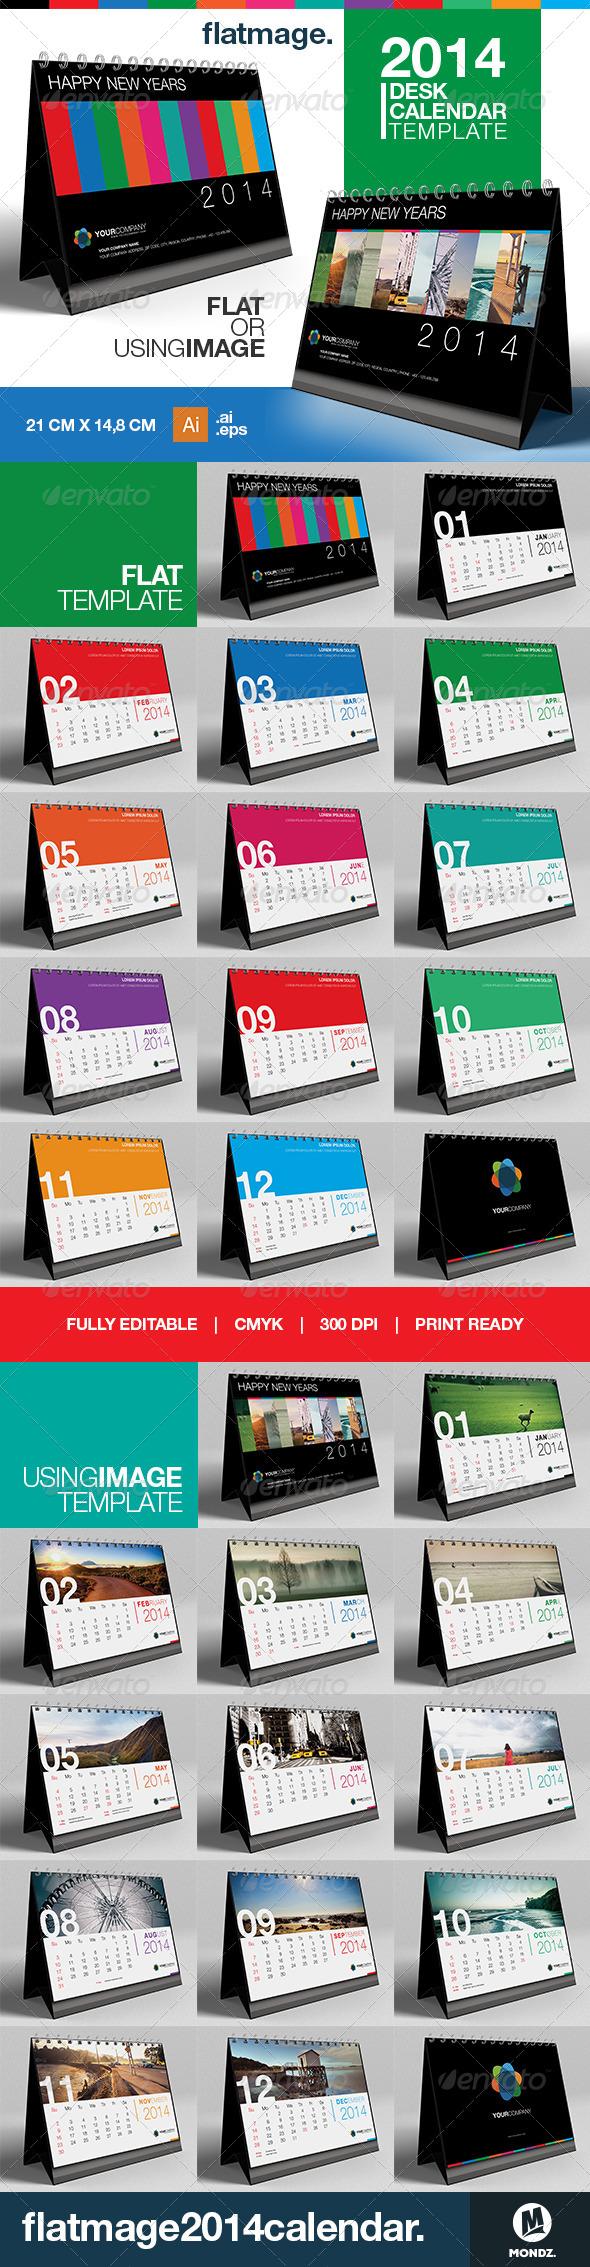 Flatmage Desk Calendar 2014 Template - Graphics